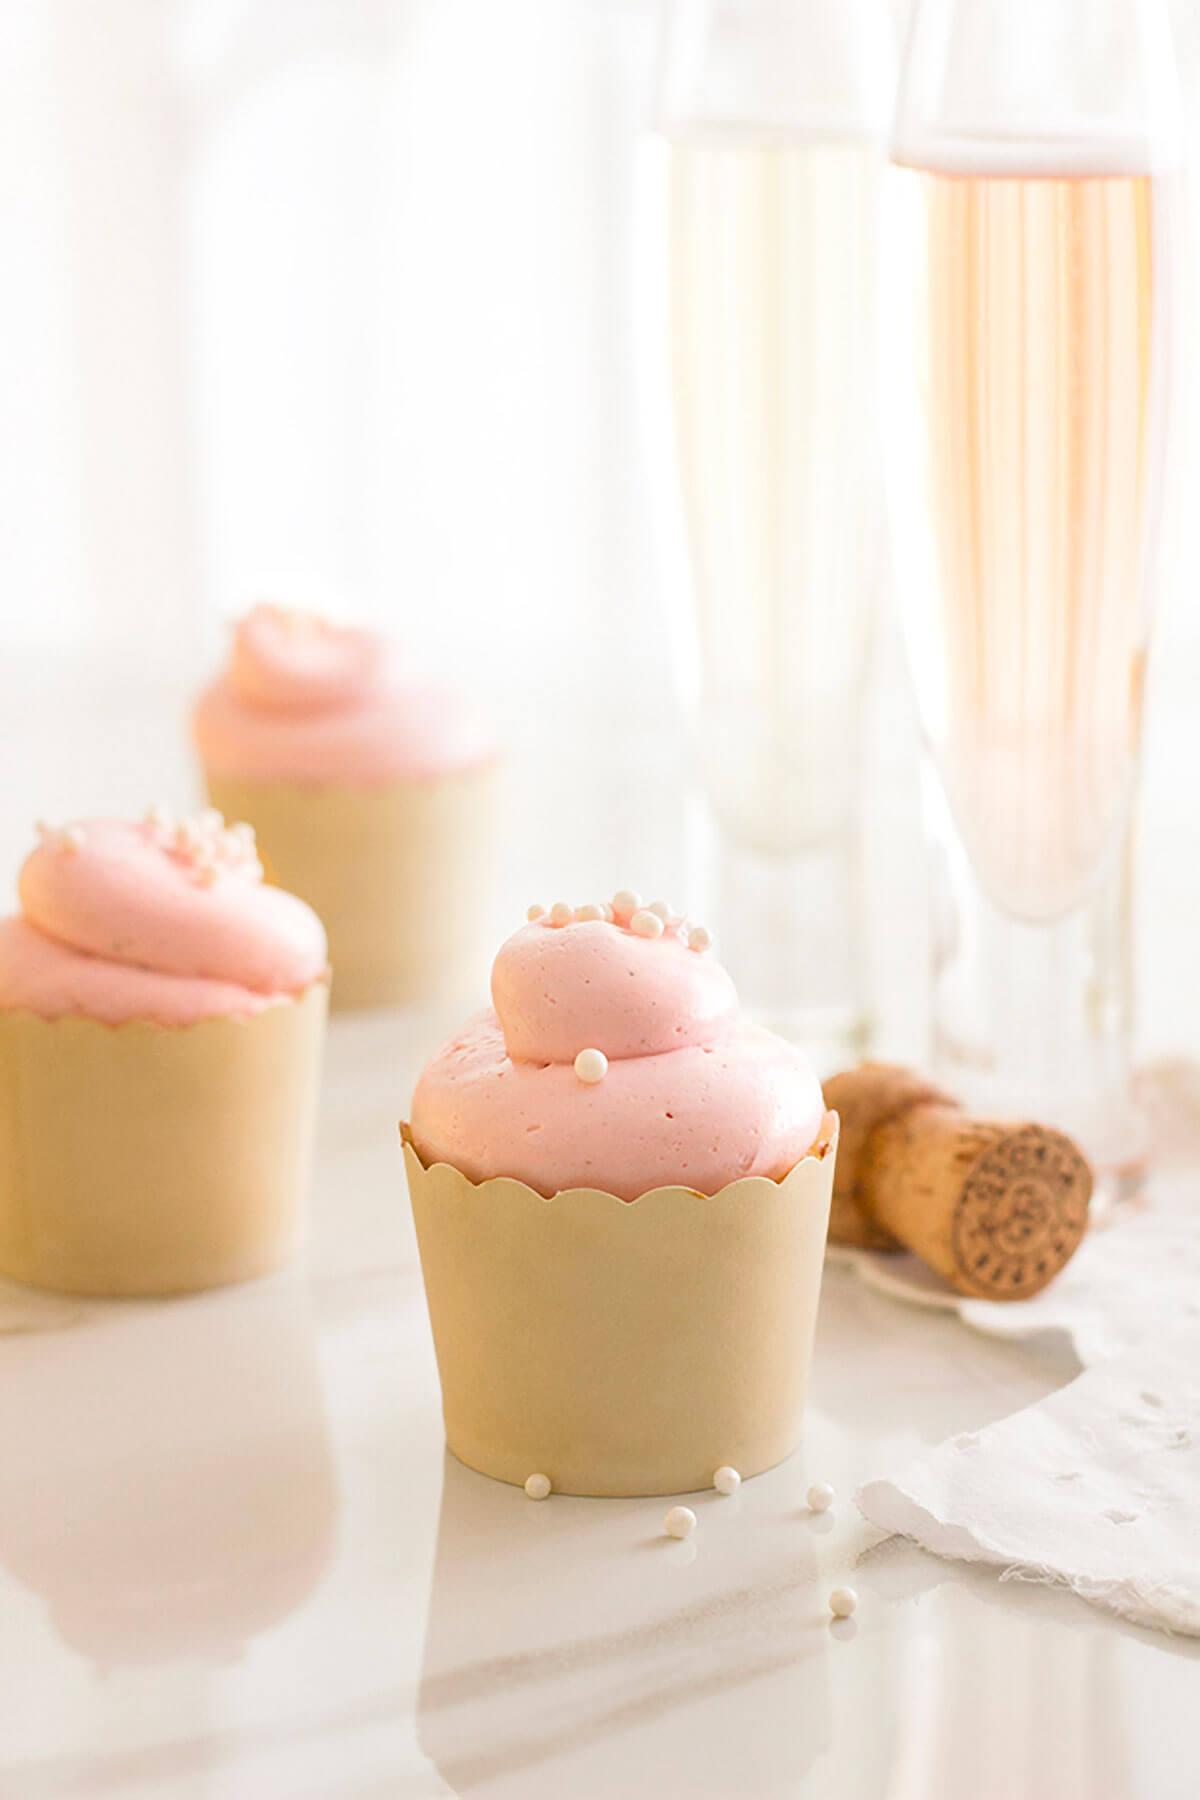 Vanilla Bean & Almond Cupcakes with Roasted Raspberry Swiss Meringue Buttercream